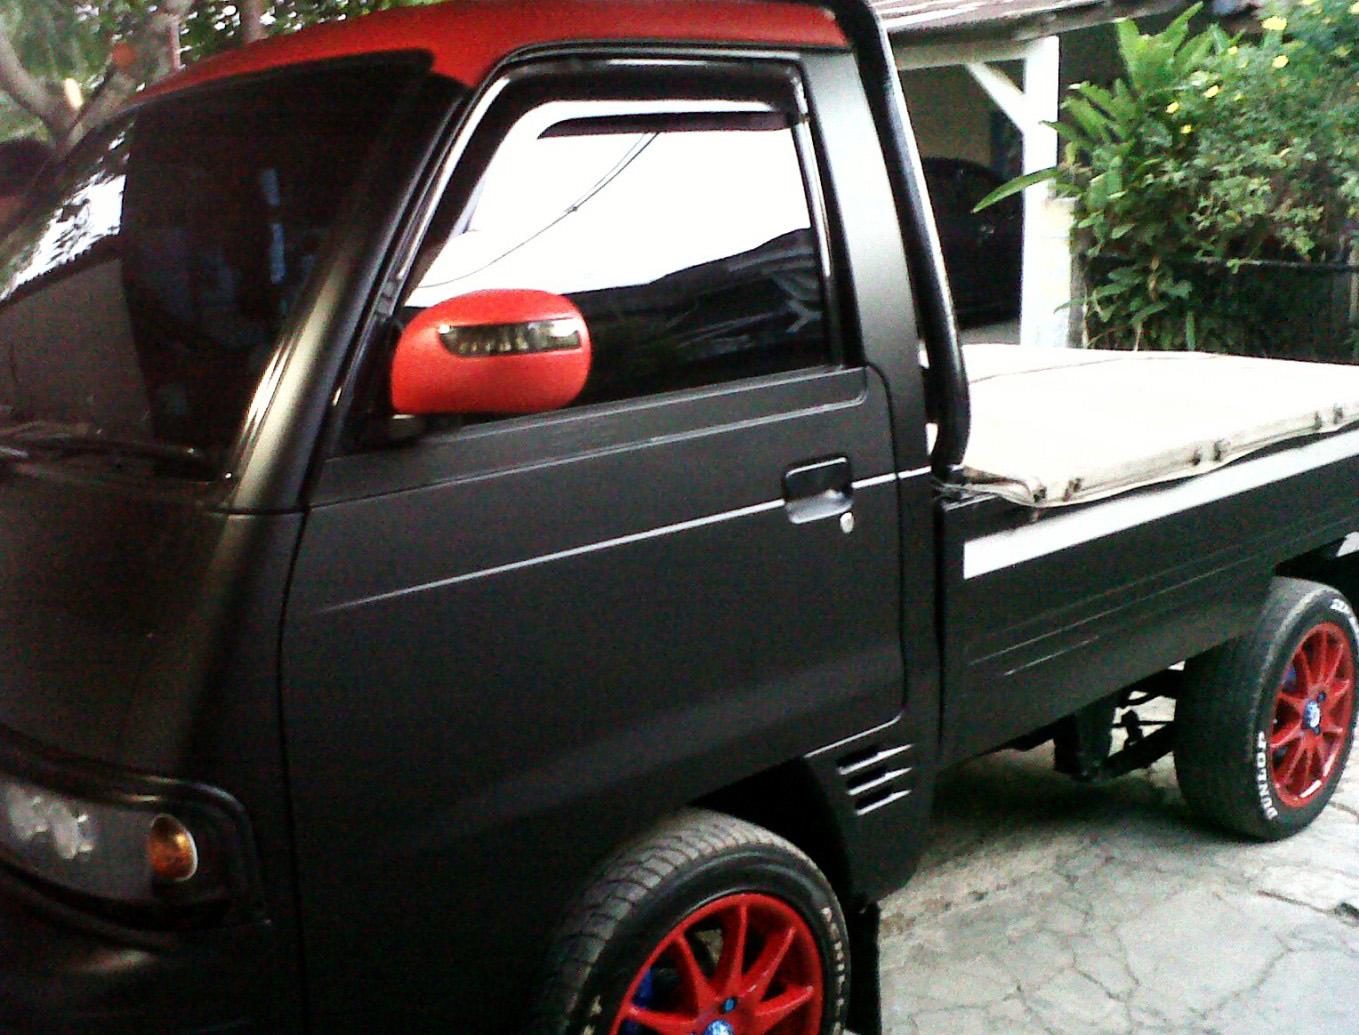 warna grand new avanza 2018 all camry 2019 malaysia kumpulan modifikasi mobil hitam doff